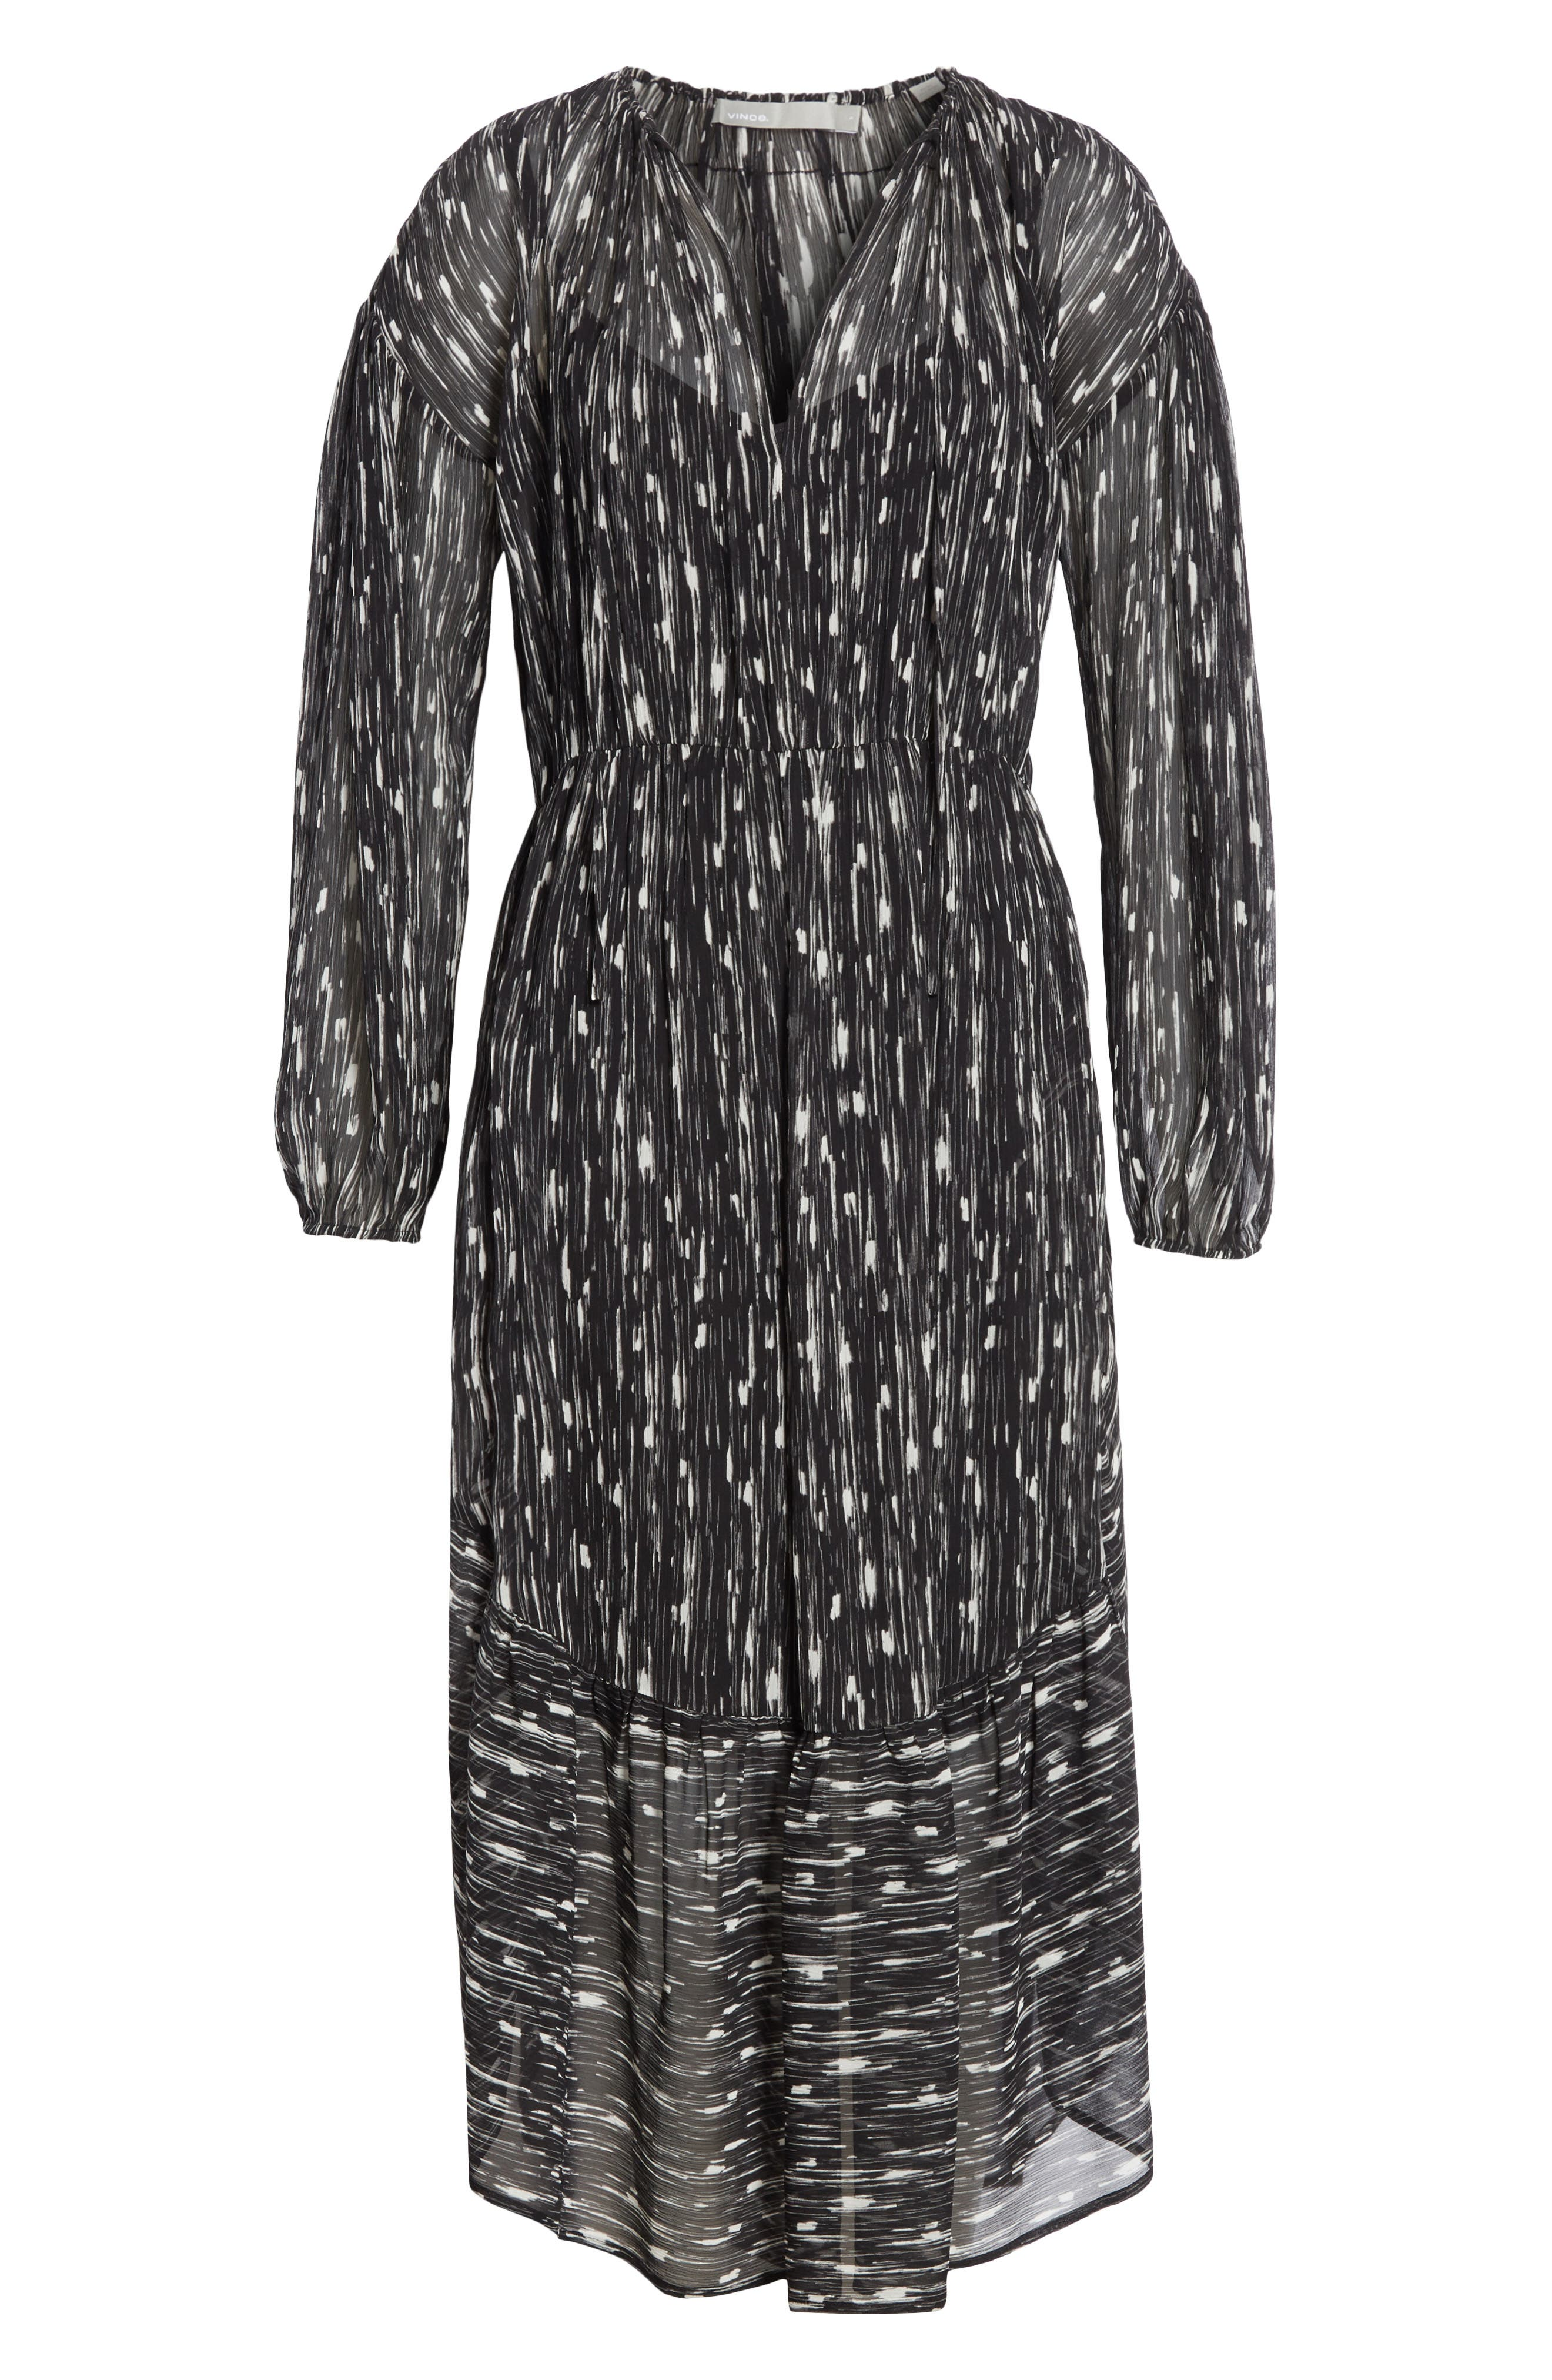 VINCE,                             Brushstroke Silk Chiffon Dress,                             Alternate thumbnail 6, color,                             001